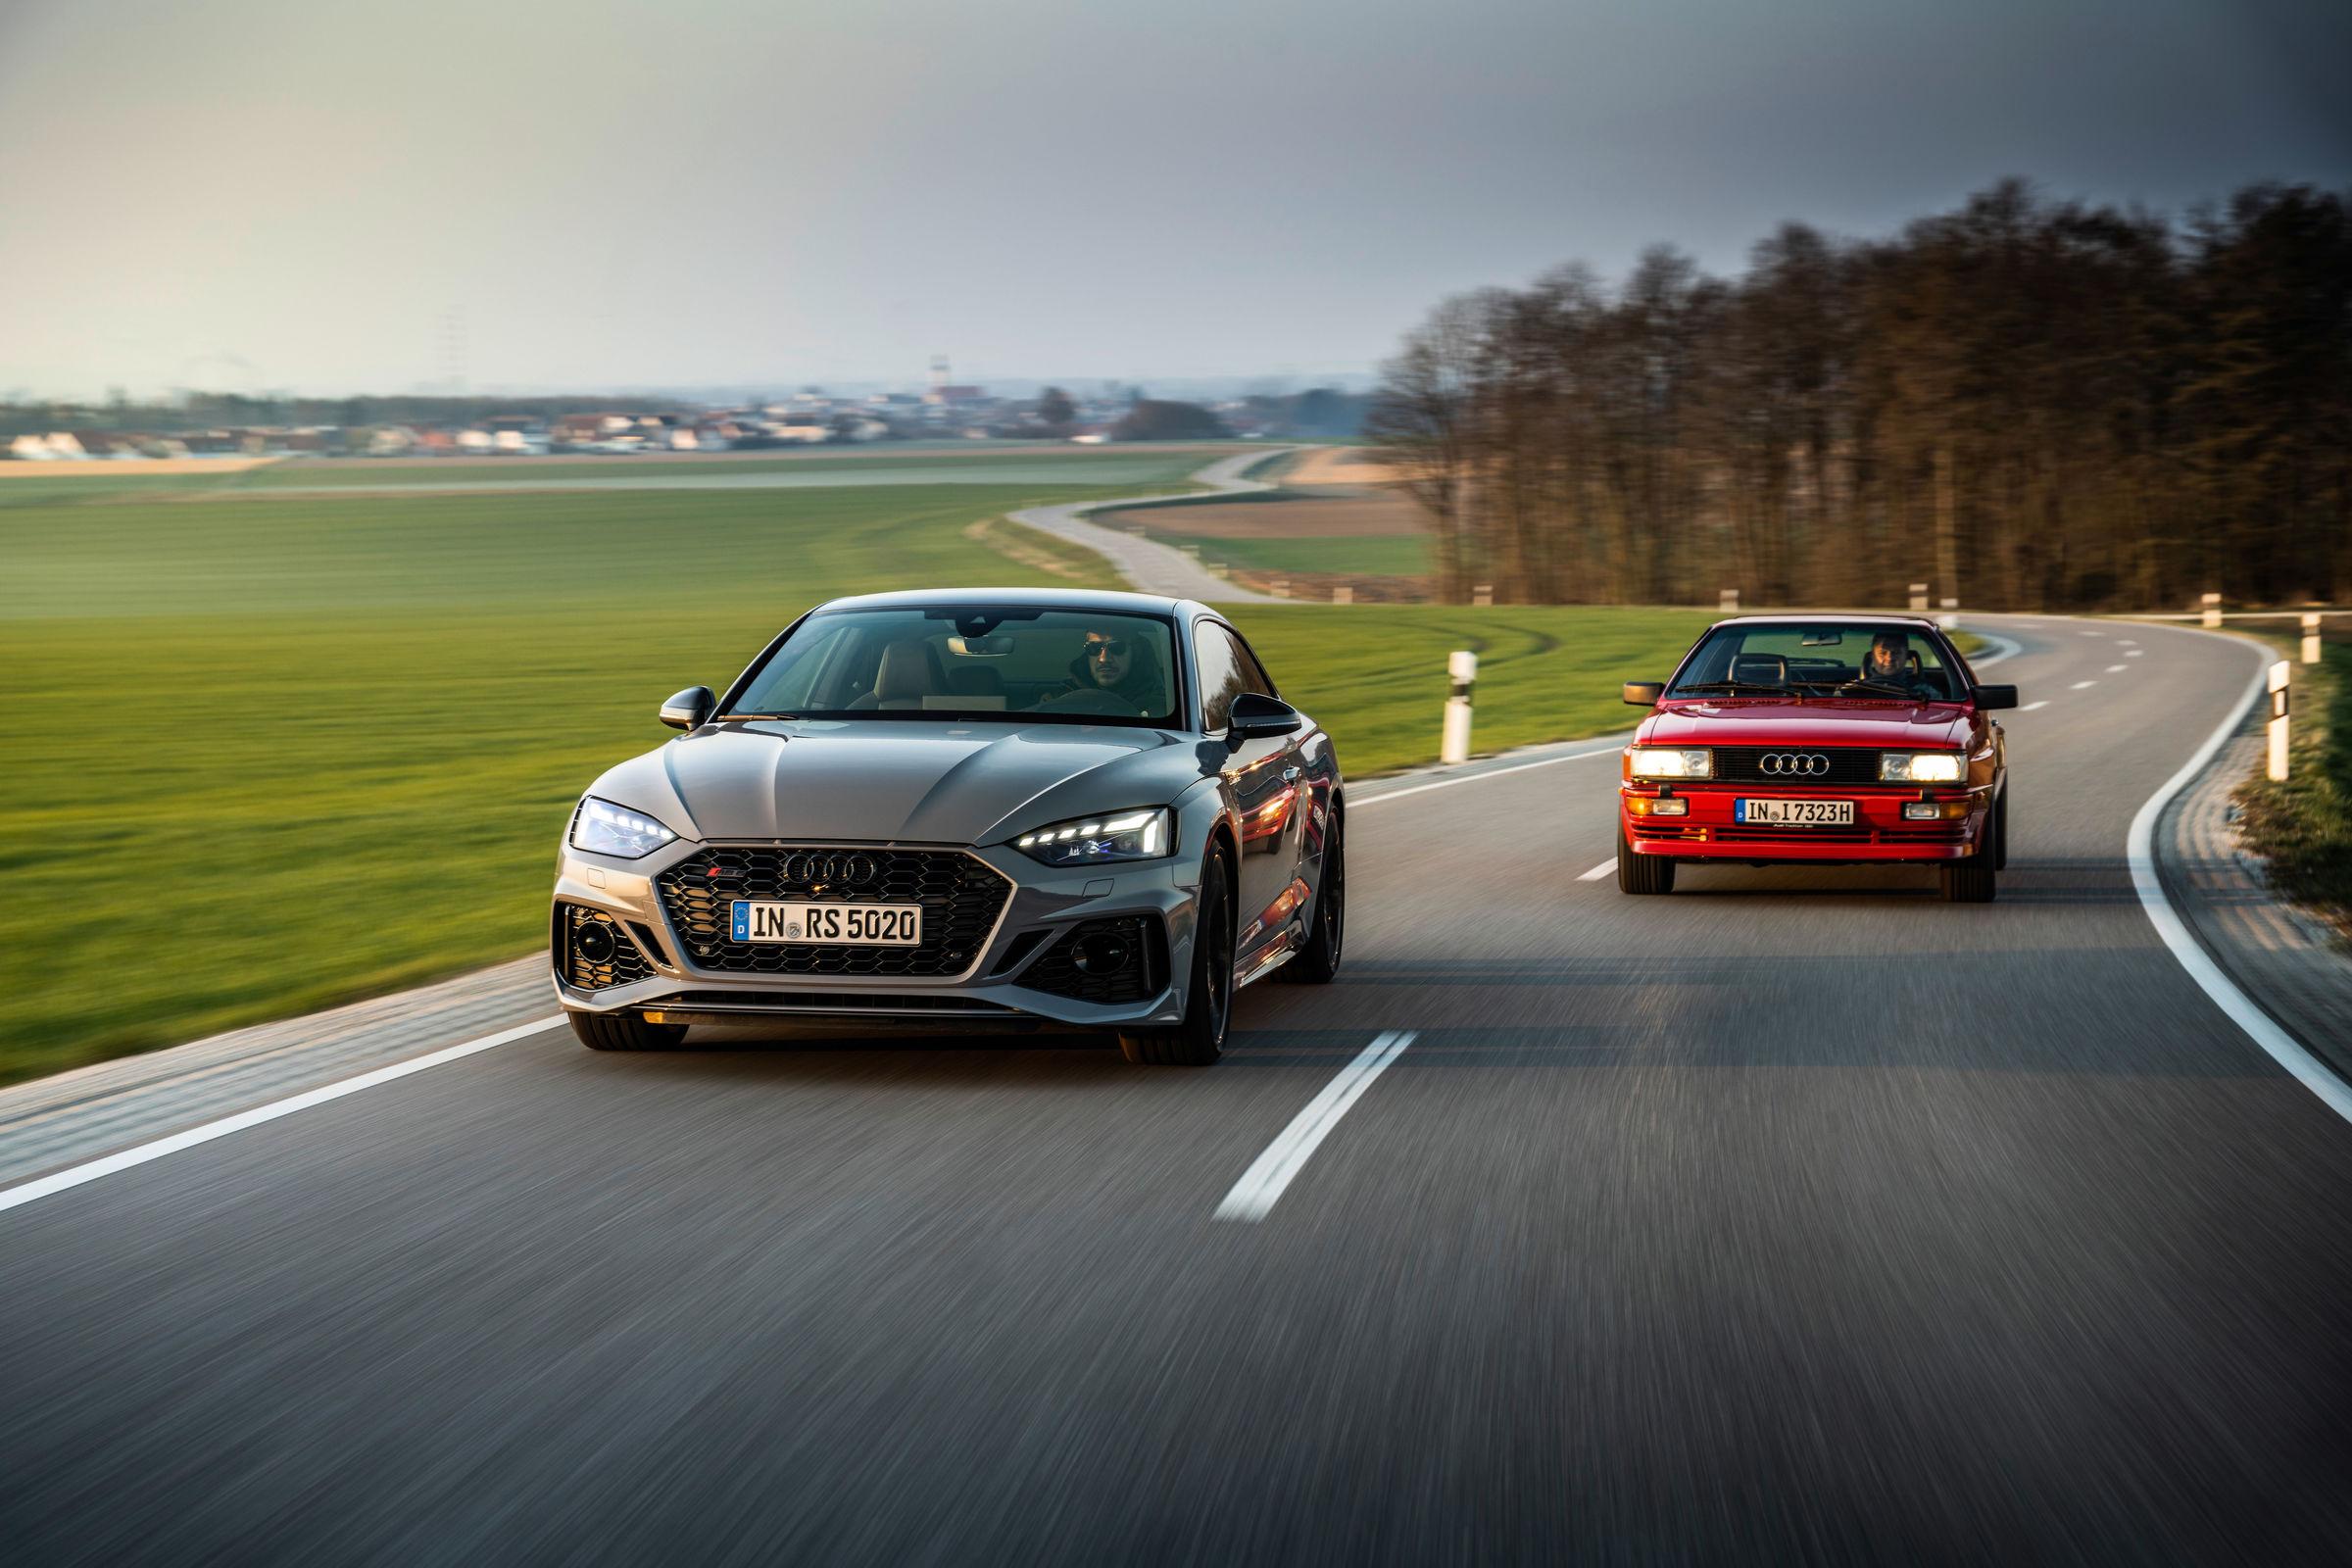 Audi RS 5 und historischer Audi quattro